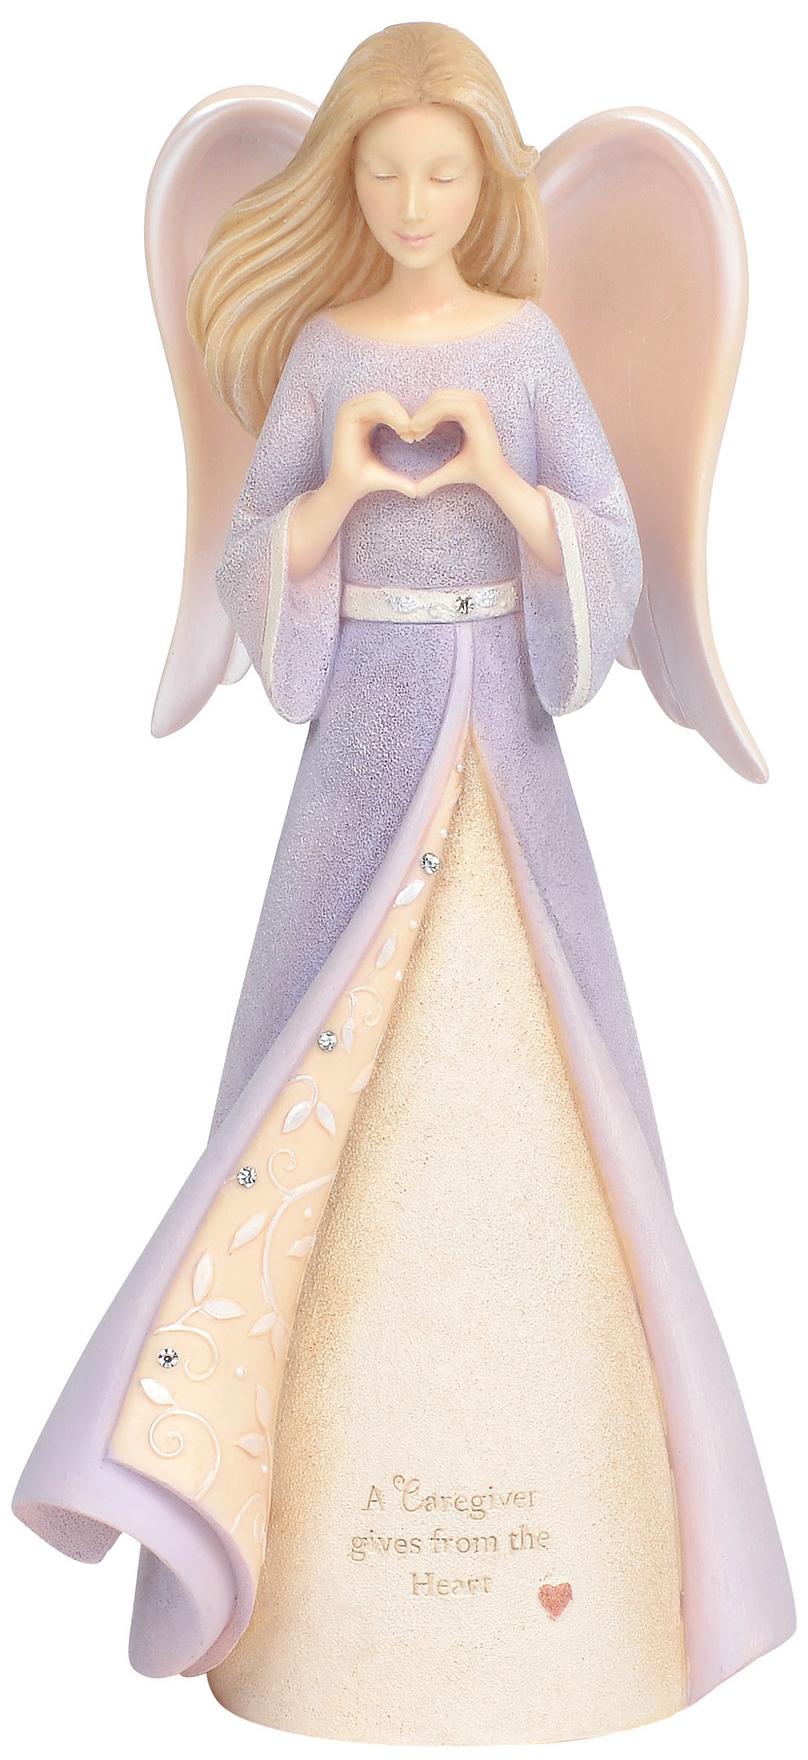 Foundations 6004089N Caregiveer Angel Figurine